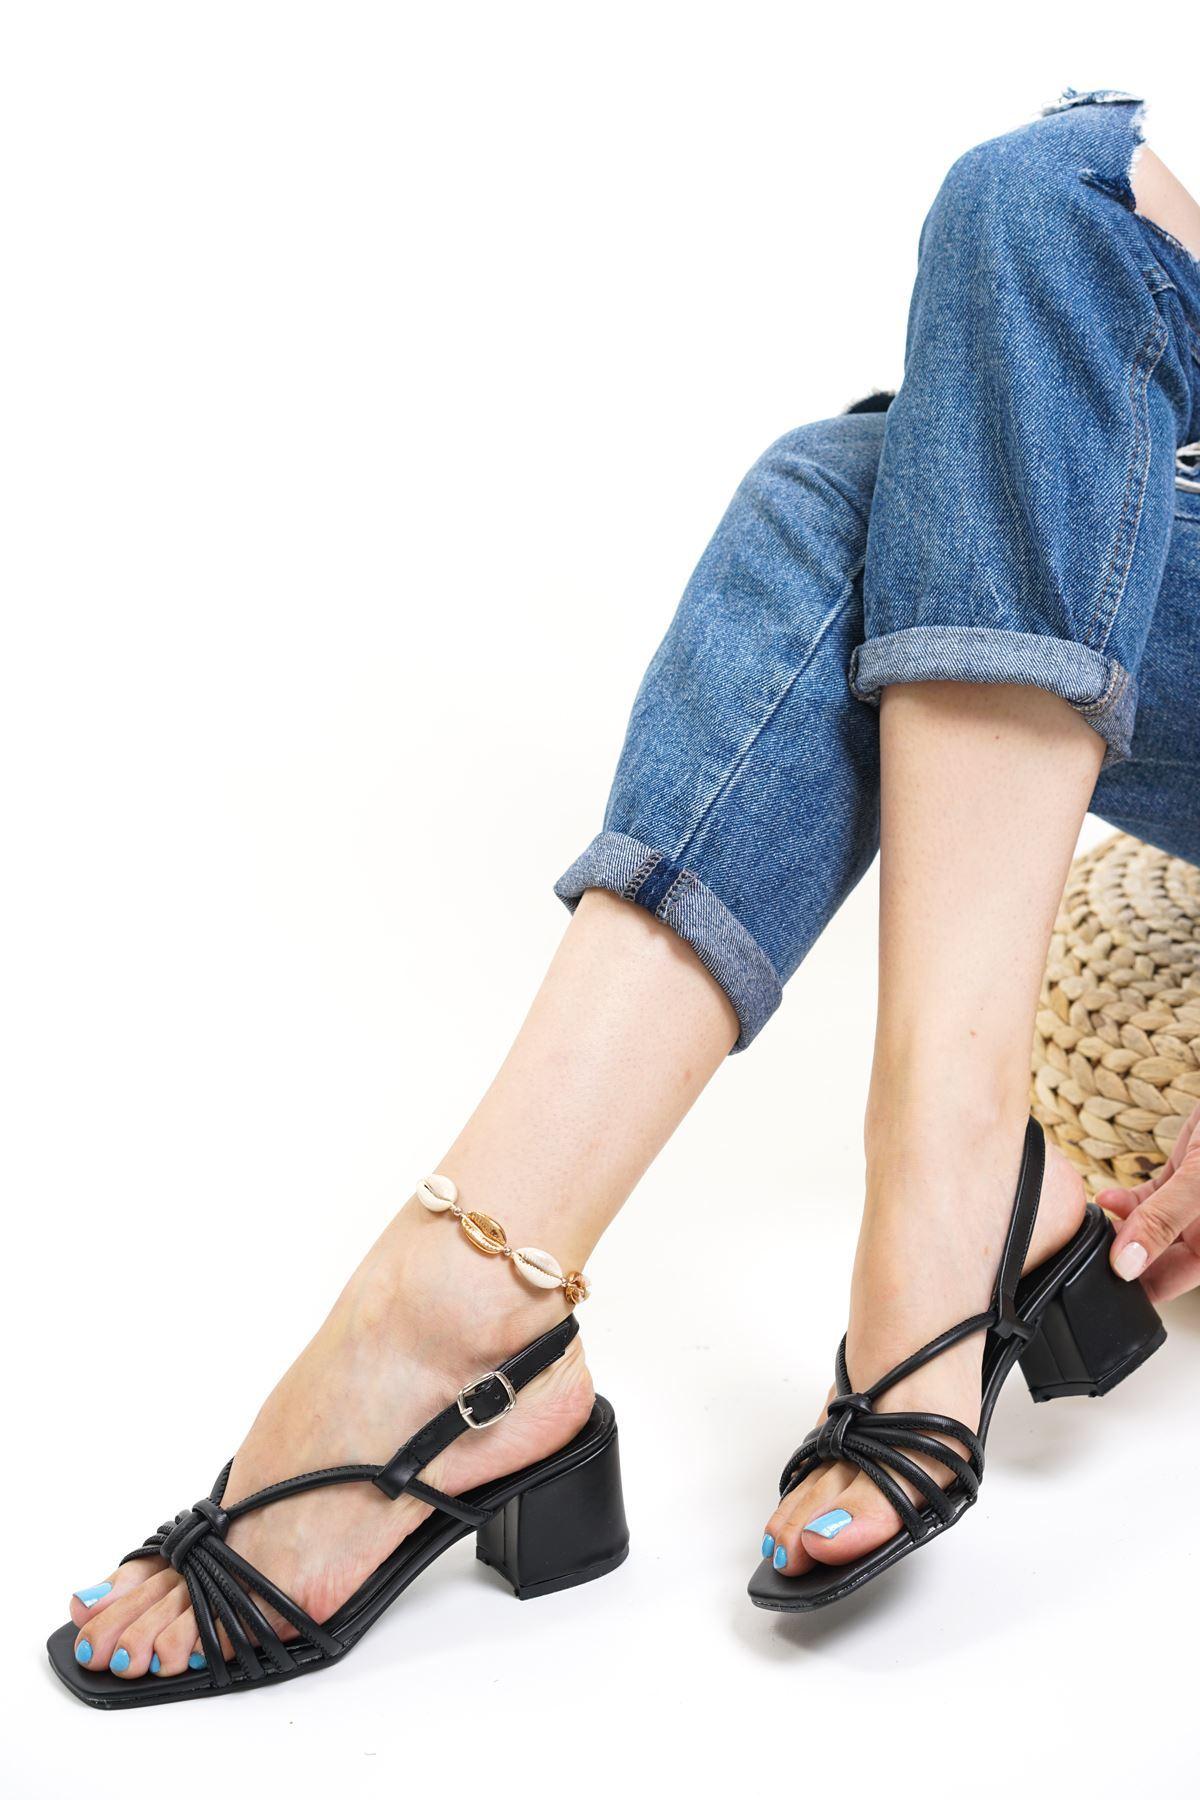 Gio Siyah Mat Deri Kadın Topuklu Ayakkabı